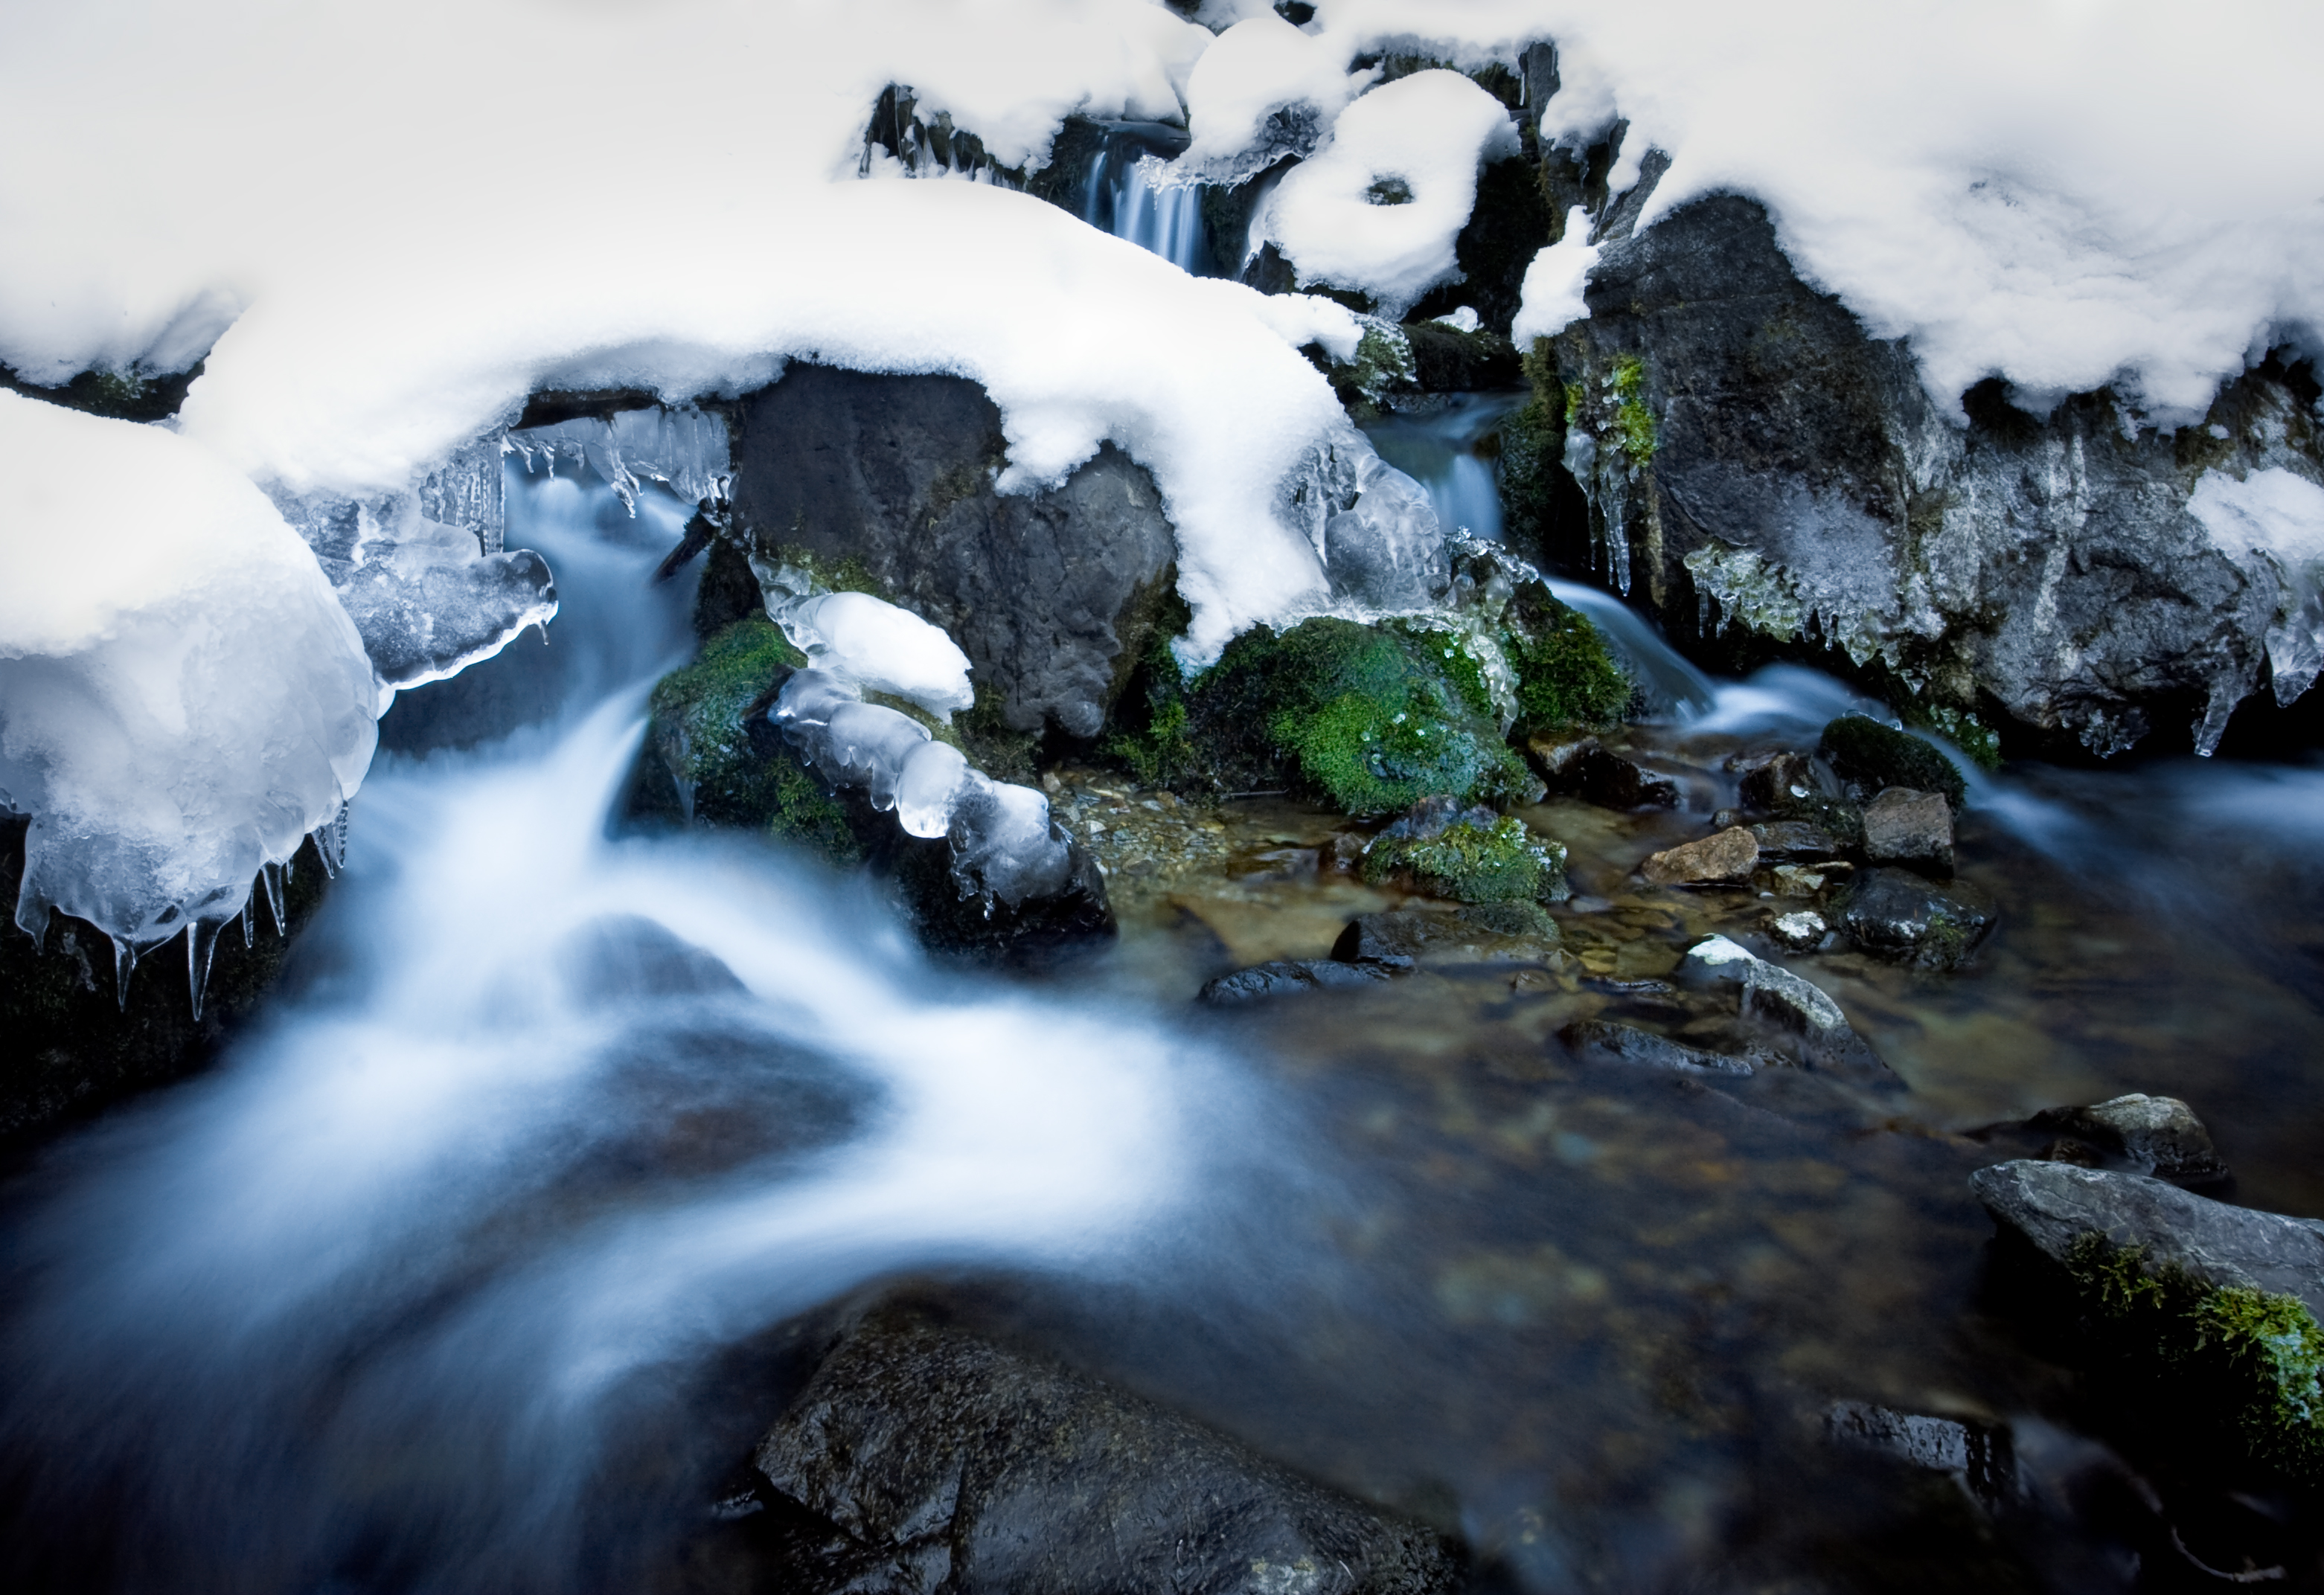 Frozen River, Blue, River, White, Wet, HQ Photo